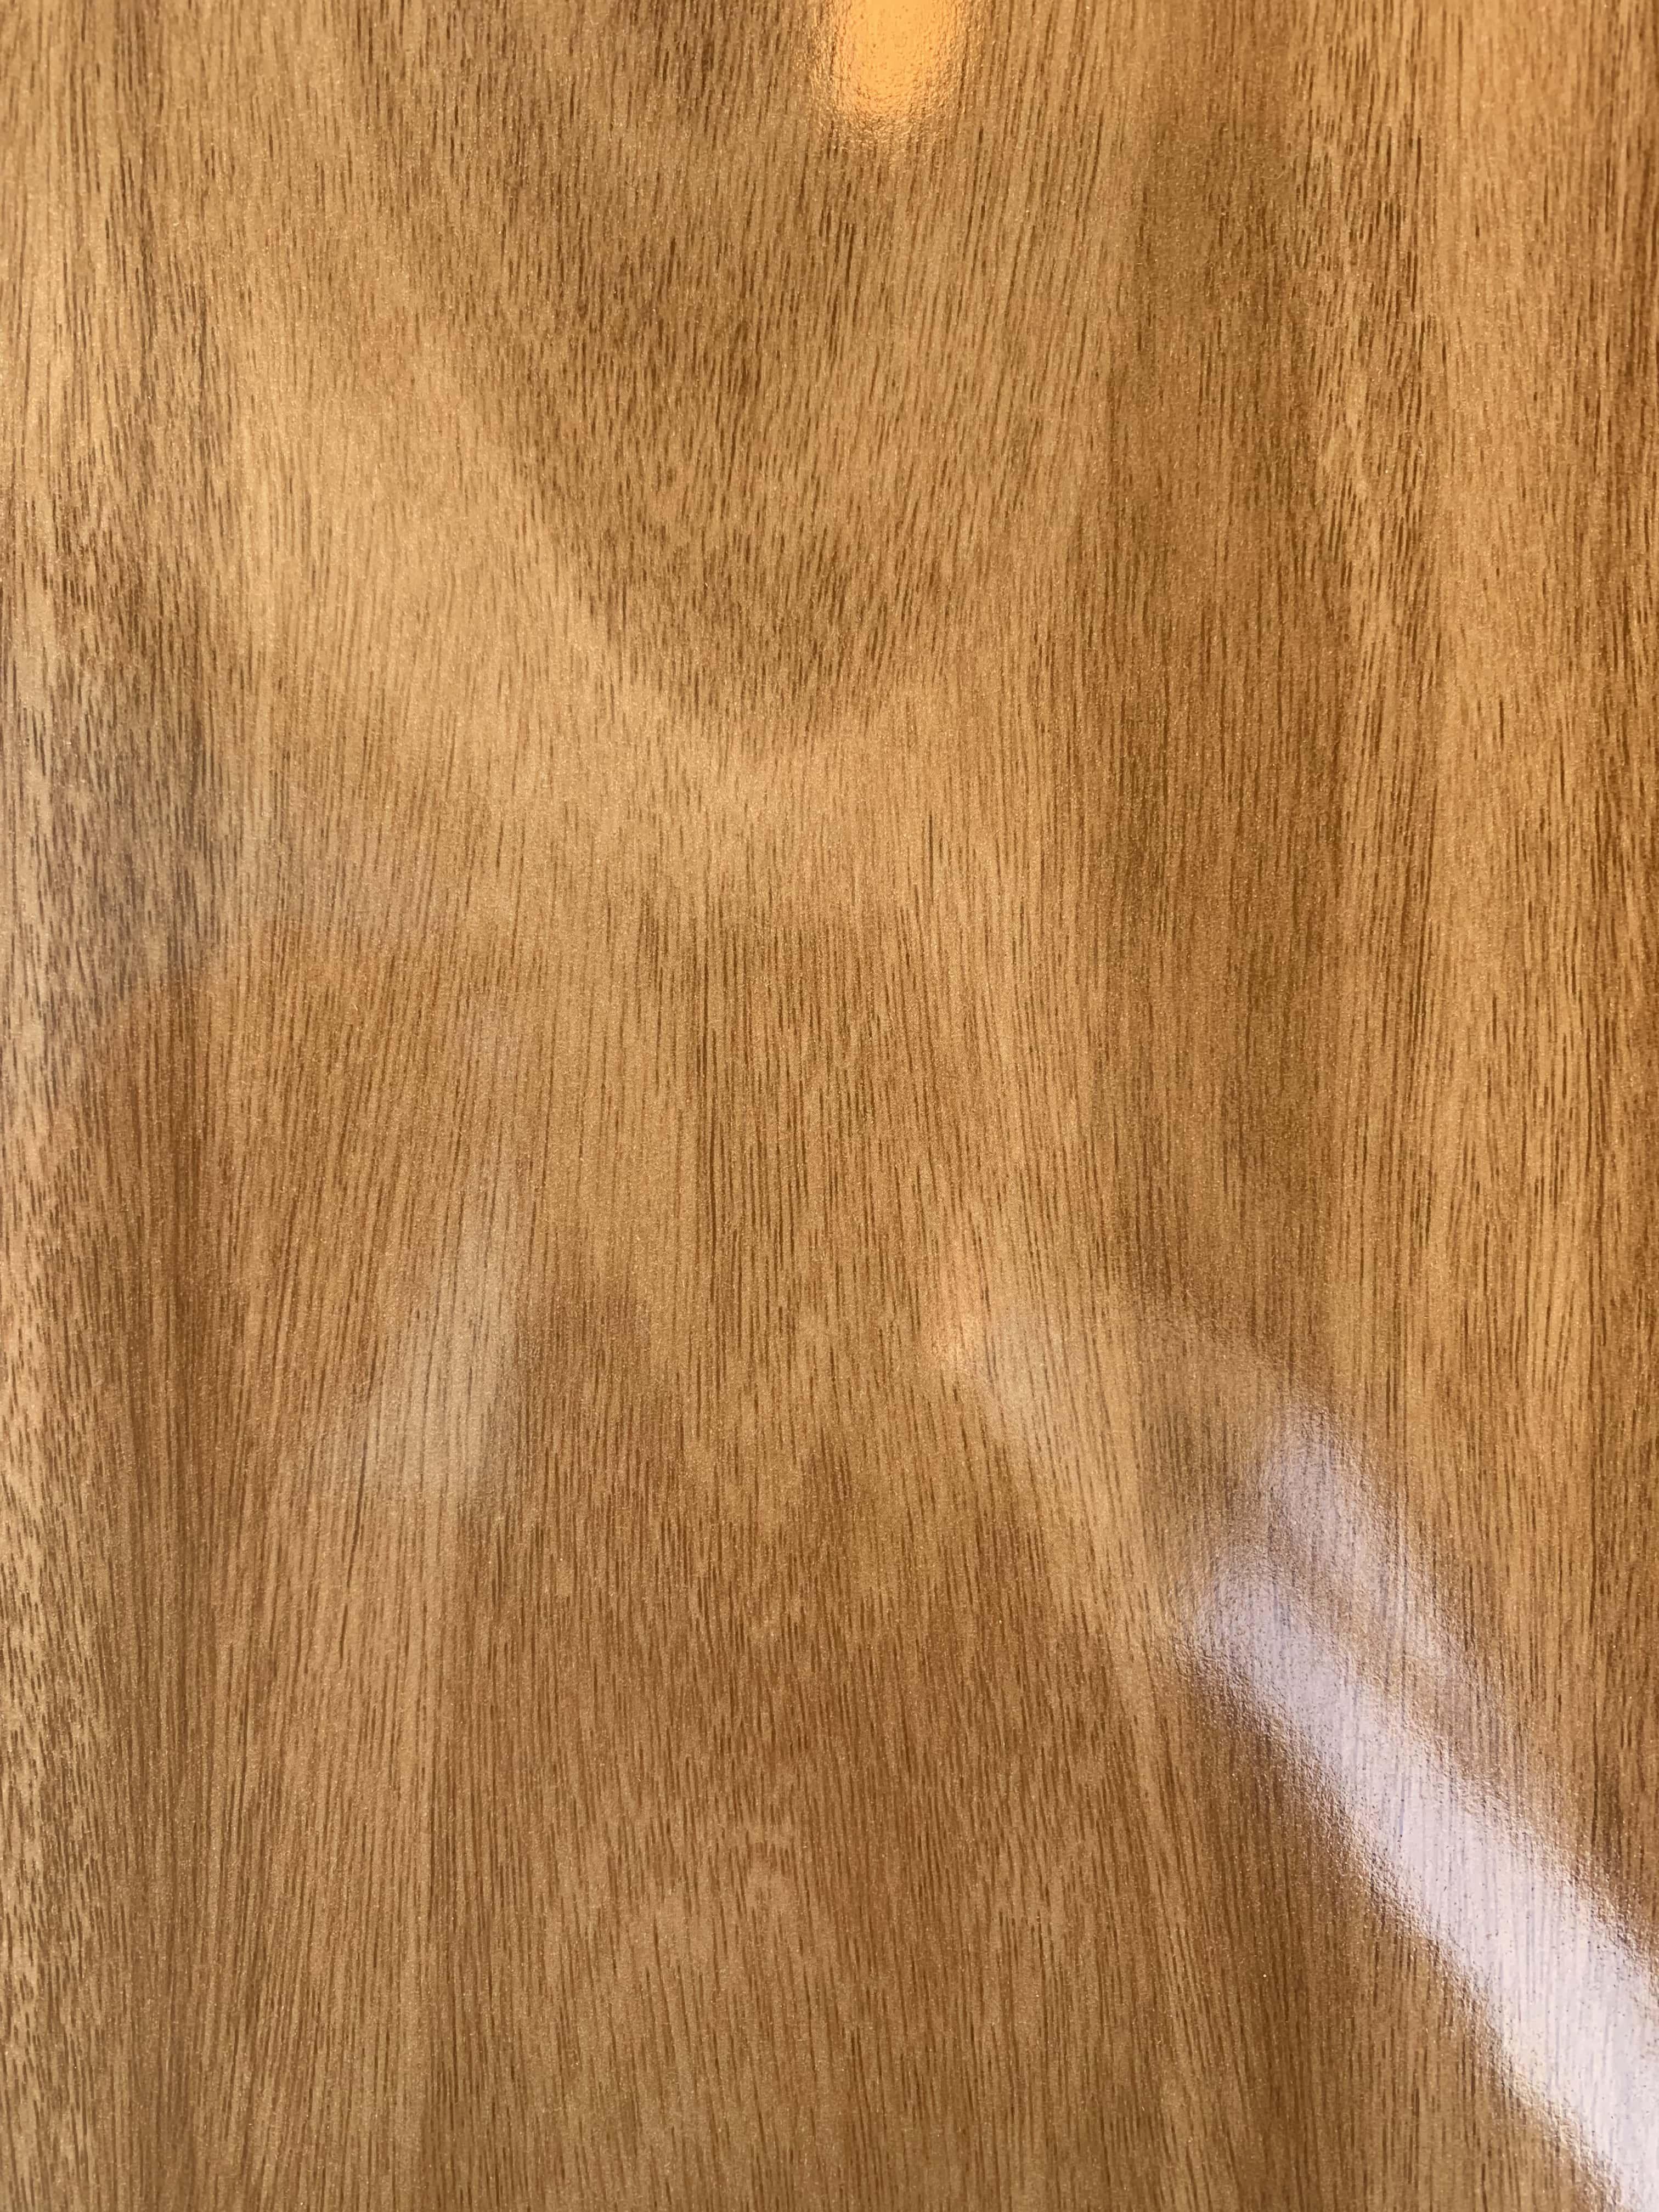 Blackbutt Gloss Laminate Flooring 1215x195x12mm